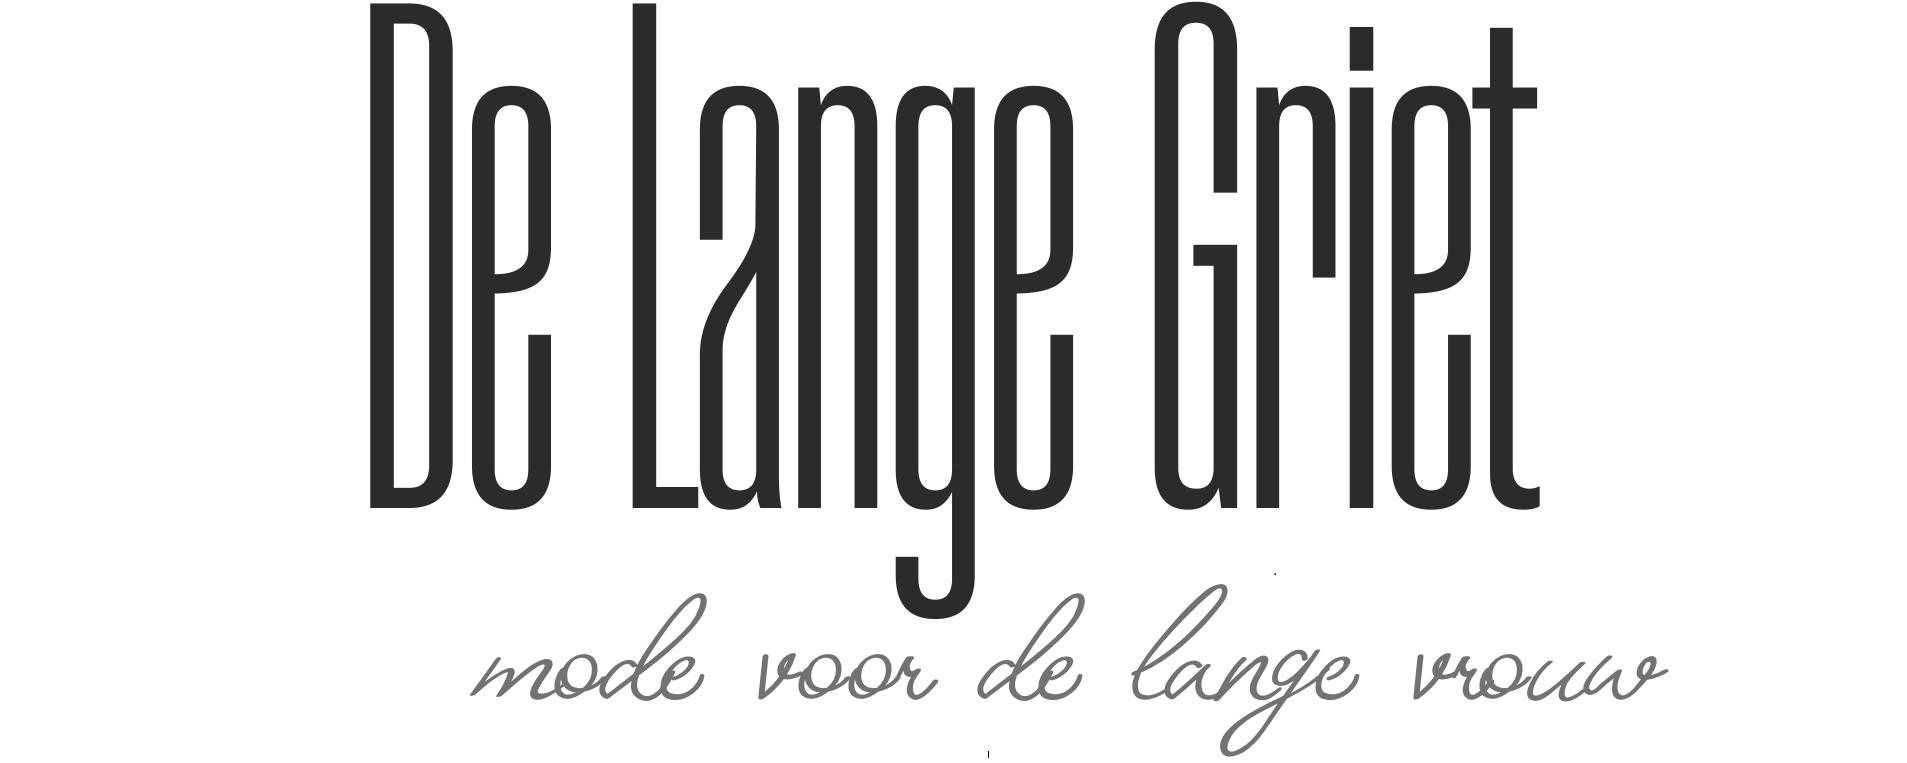 De Lange Griet